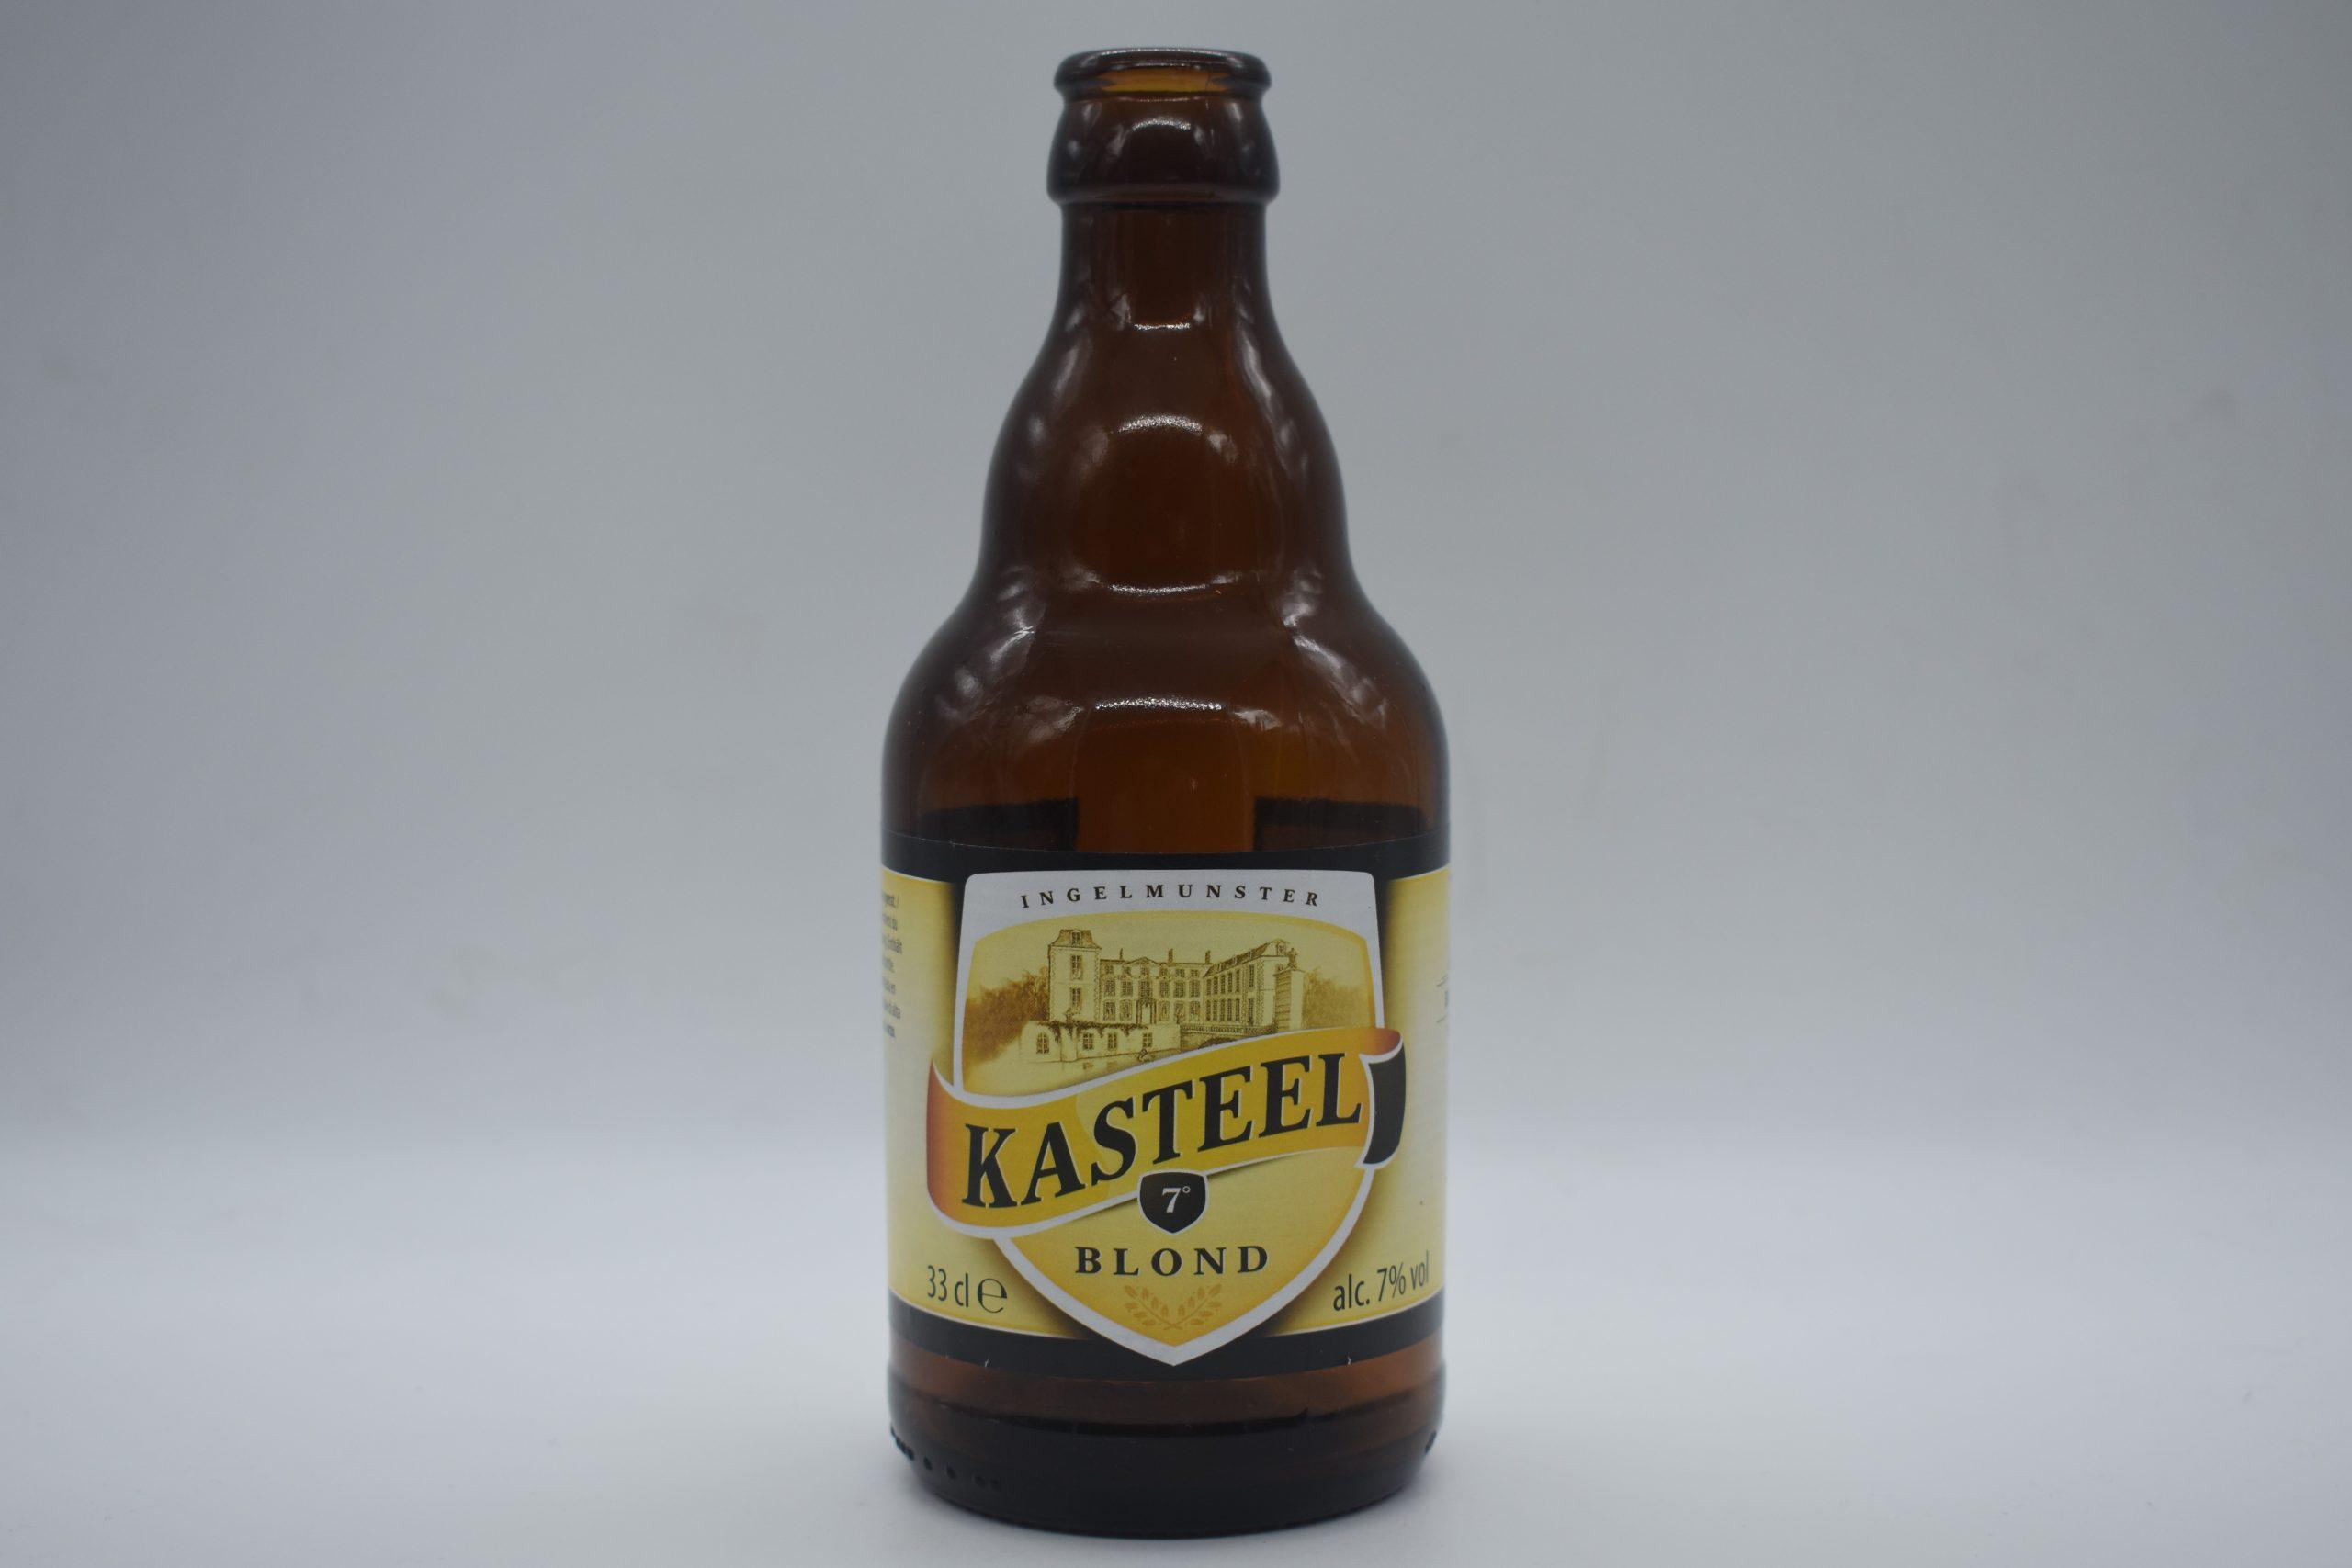 Cervezas belgas. Kastel blond